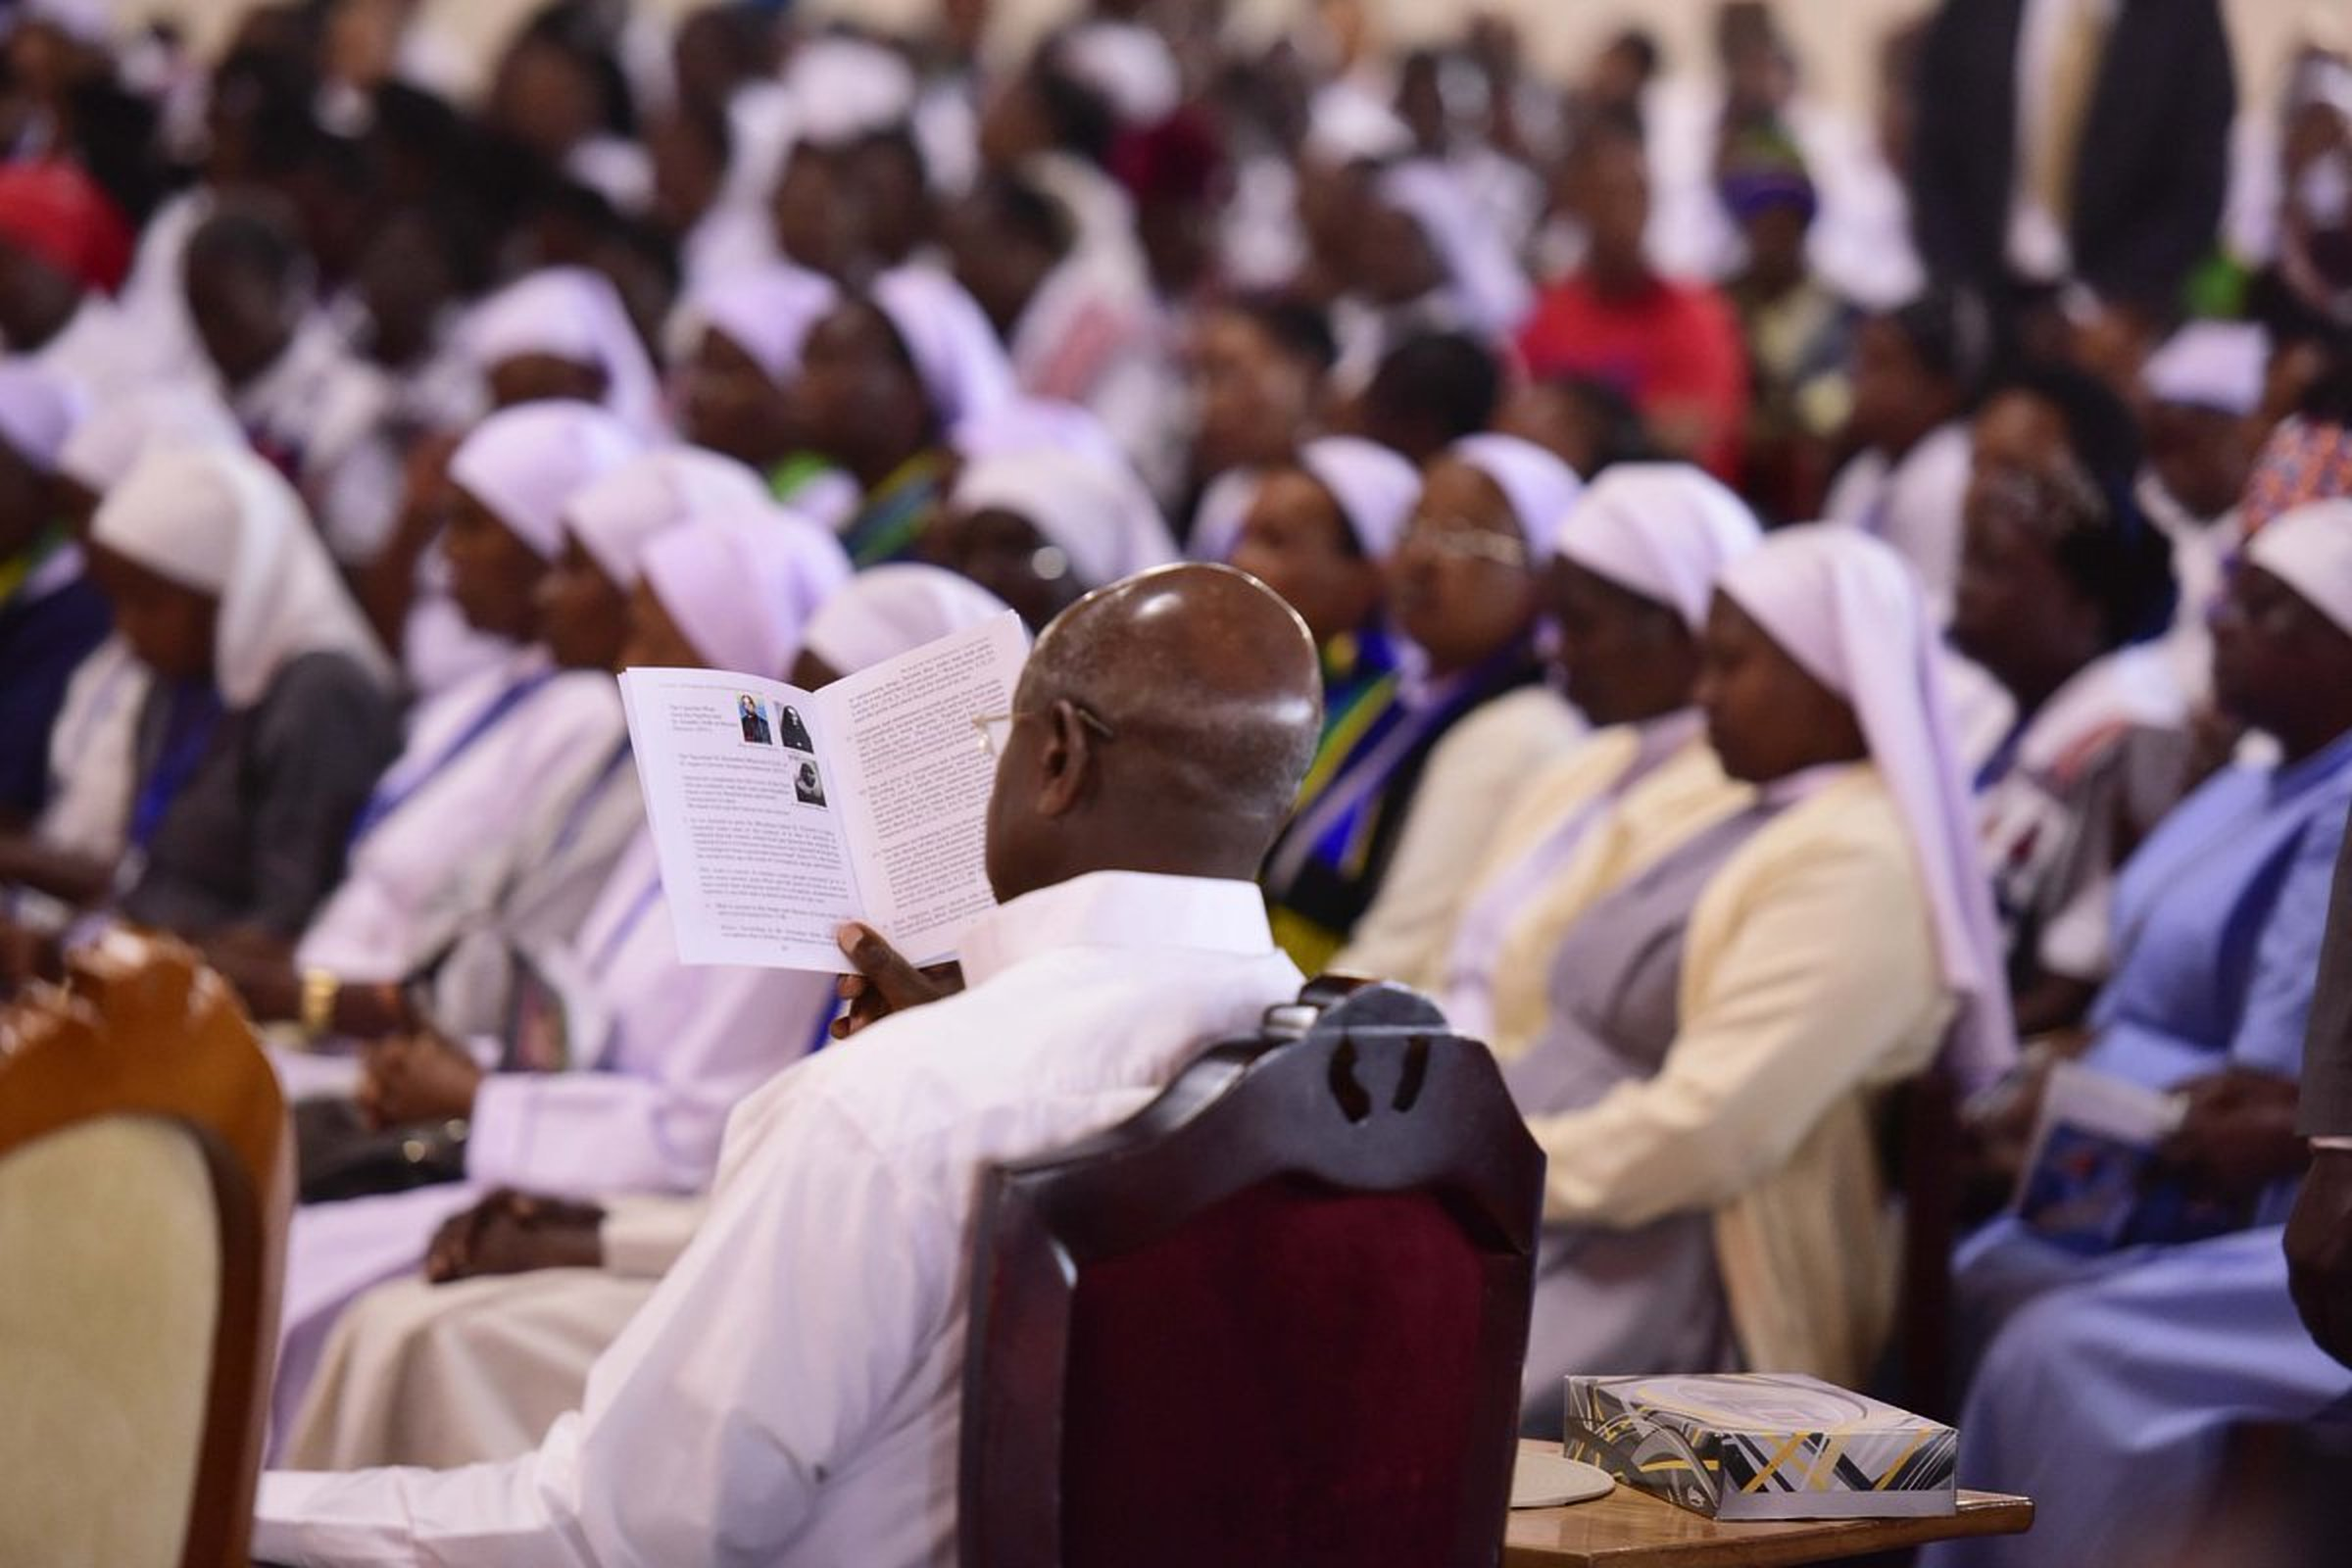 President Museveni joins Catholic faithfuls in Namugongo to celebrate Nyerere Day ahead of   Martyrs Day 2018 (PPU PHOTO)